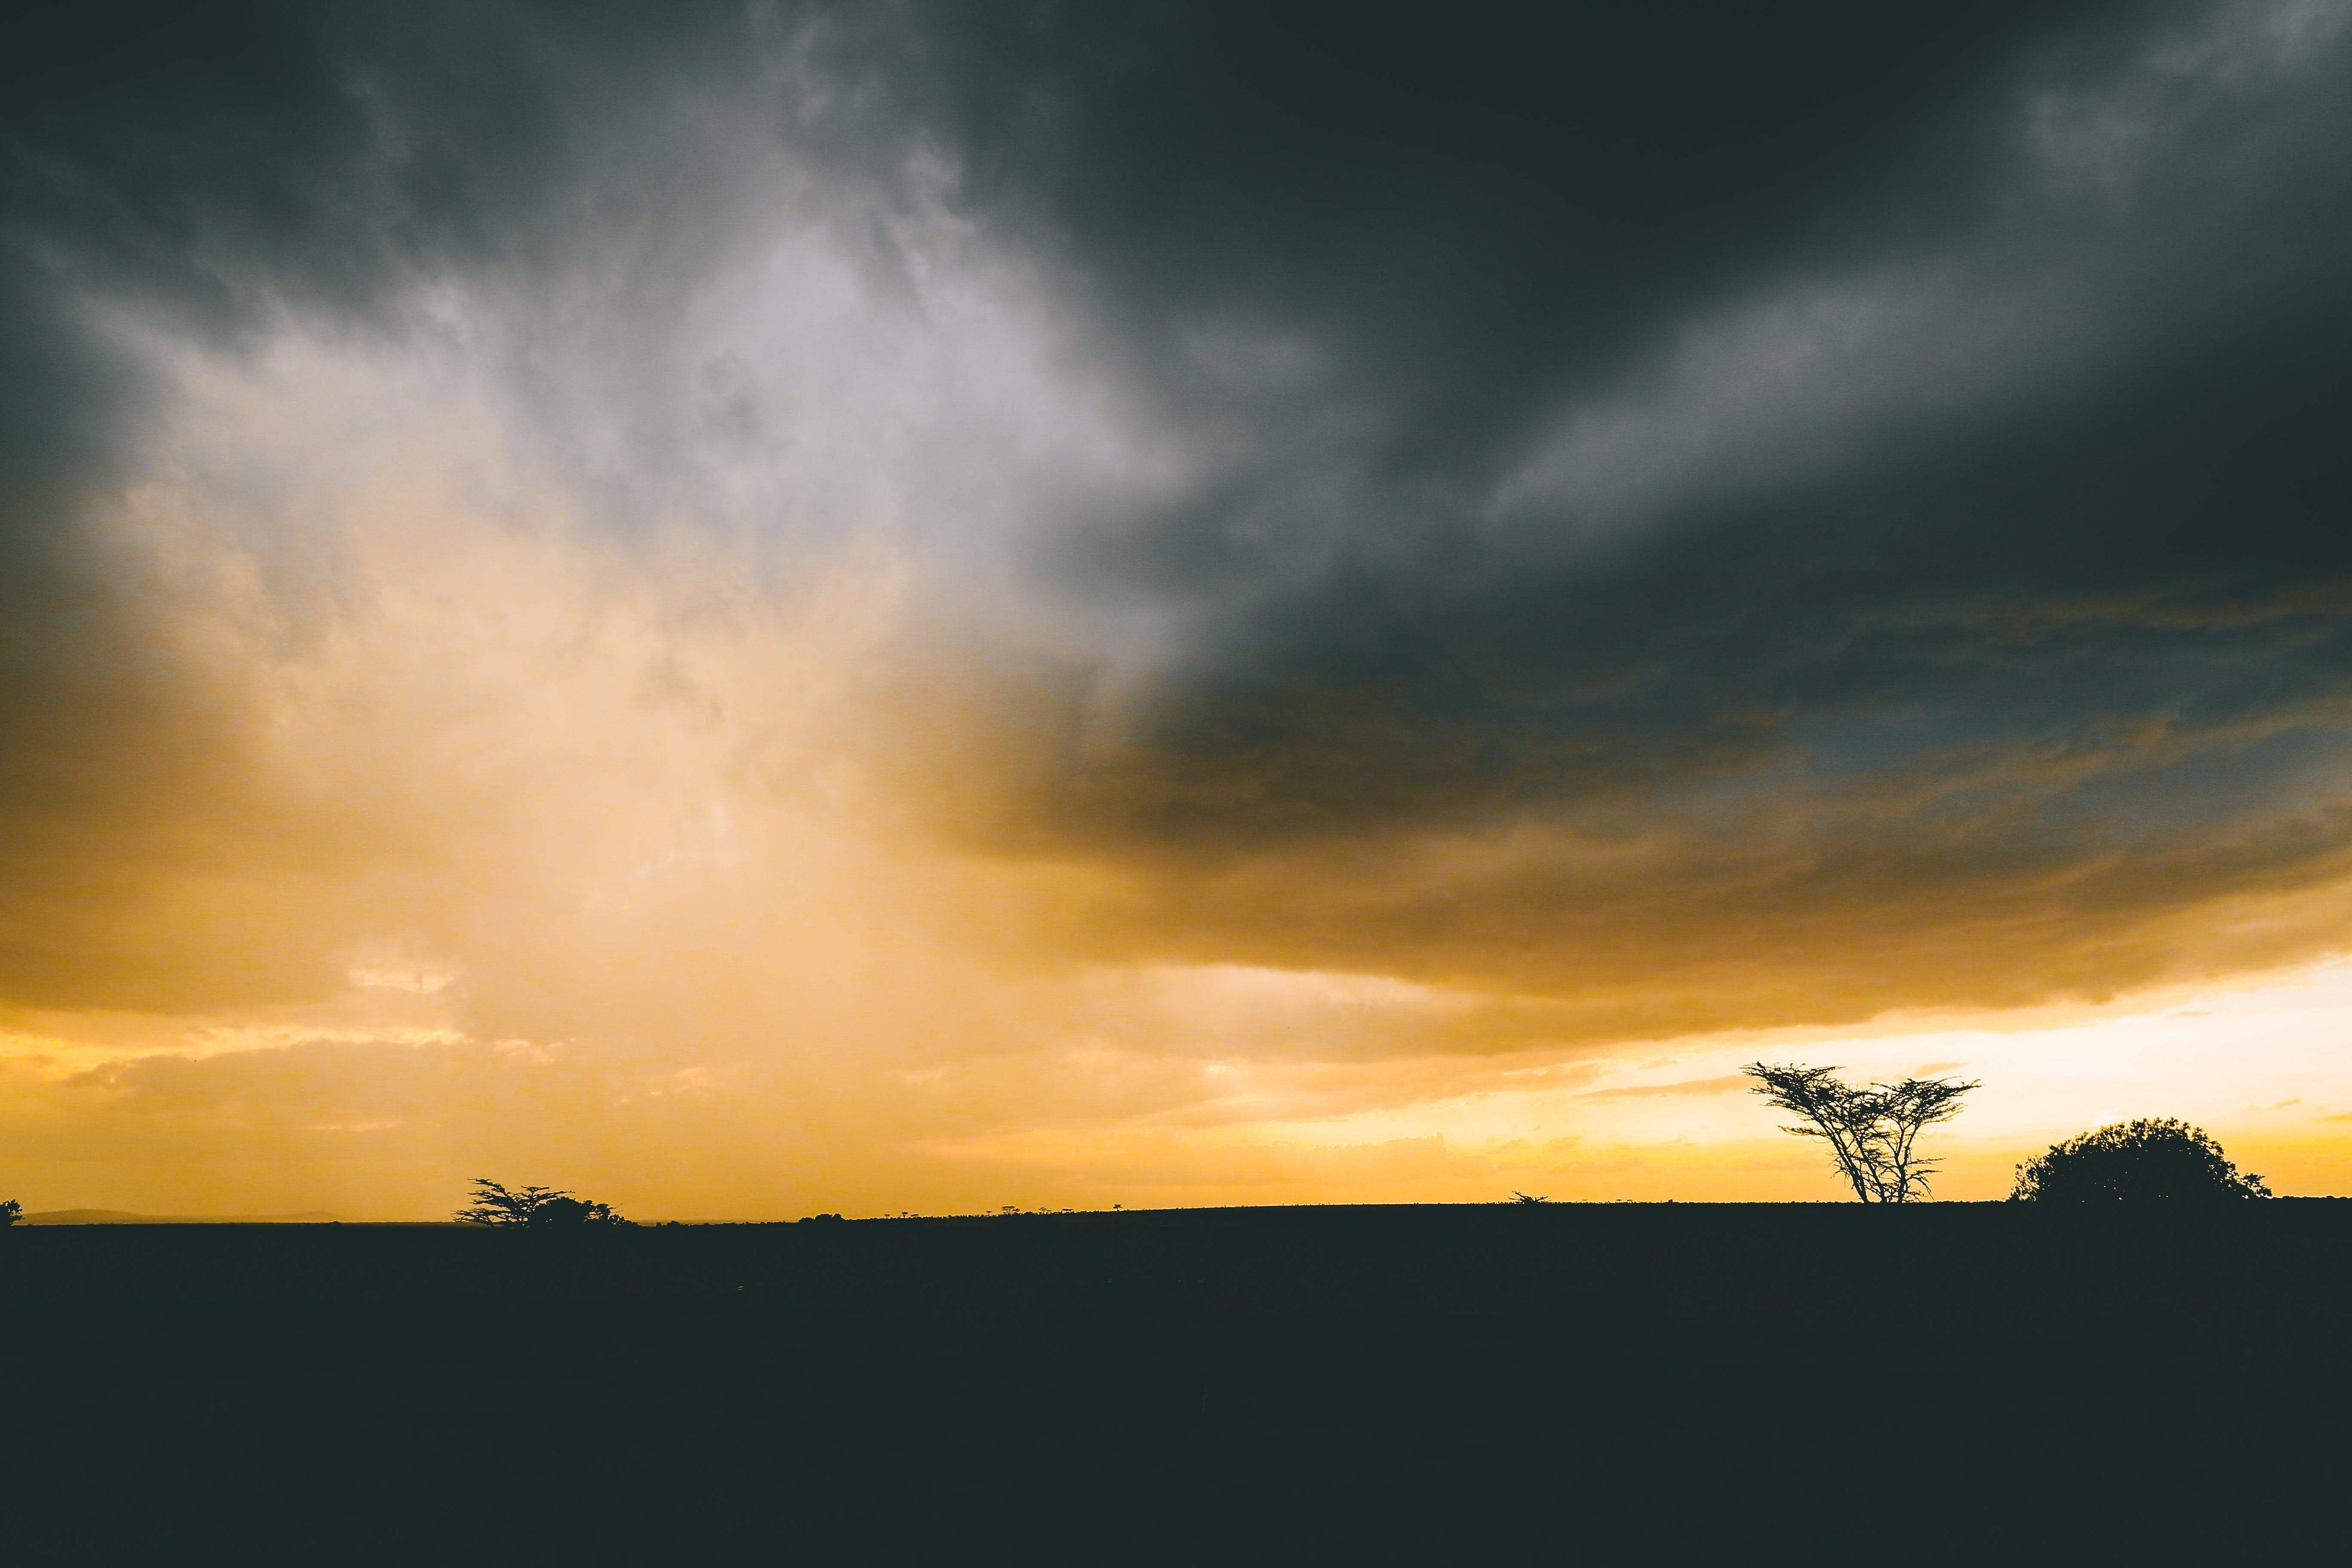 Silhouette of Tree Under Cumulus Clouds